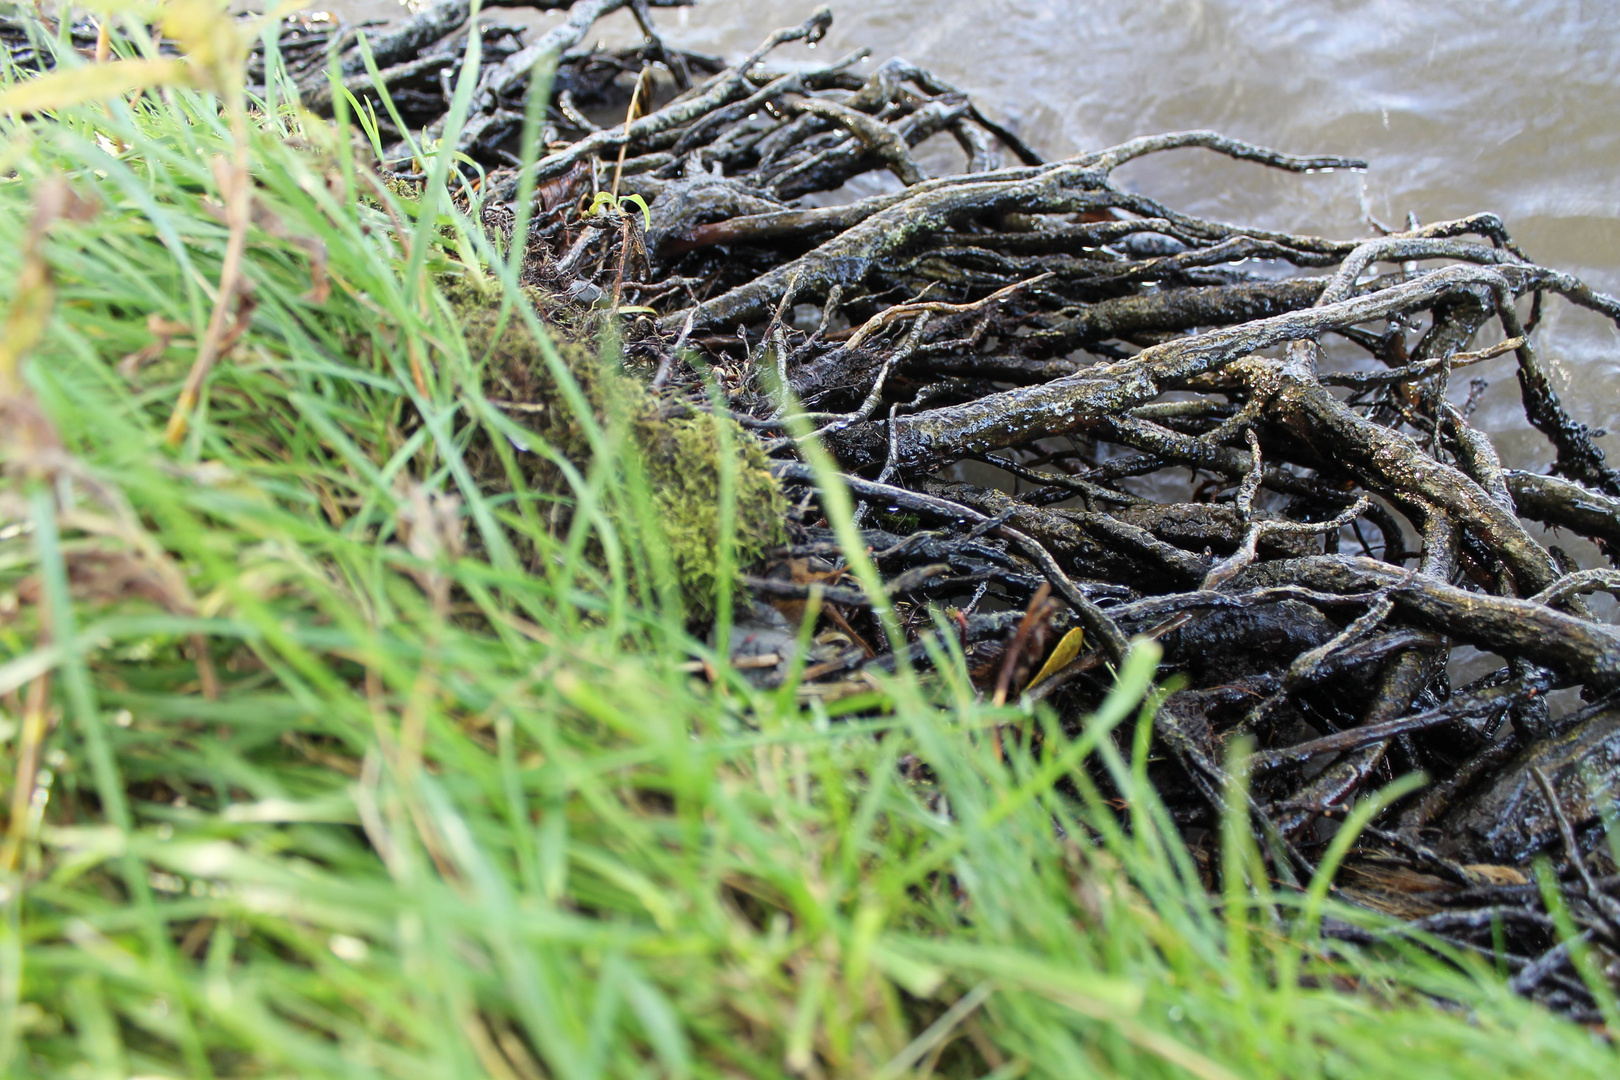 Uferbewuchs am Schweriner See